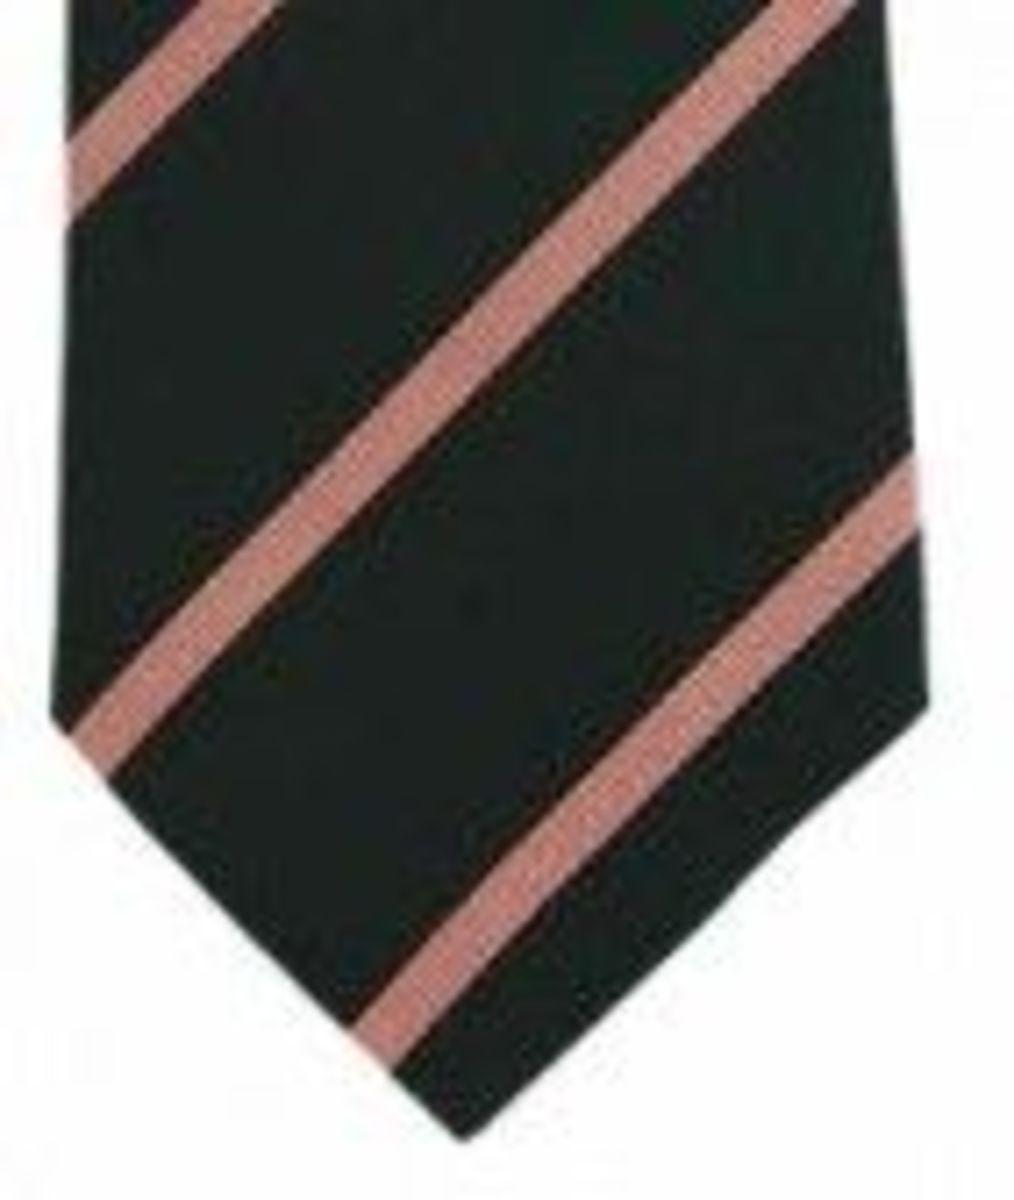 http://www.smartturnout.co.uk/products/ties/old-school-ties.html